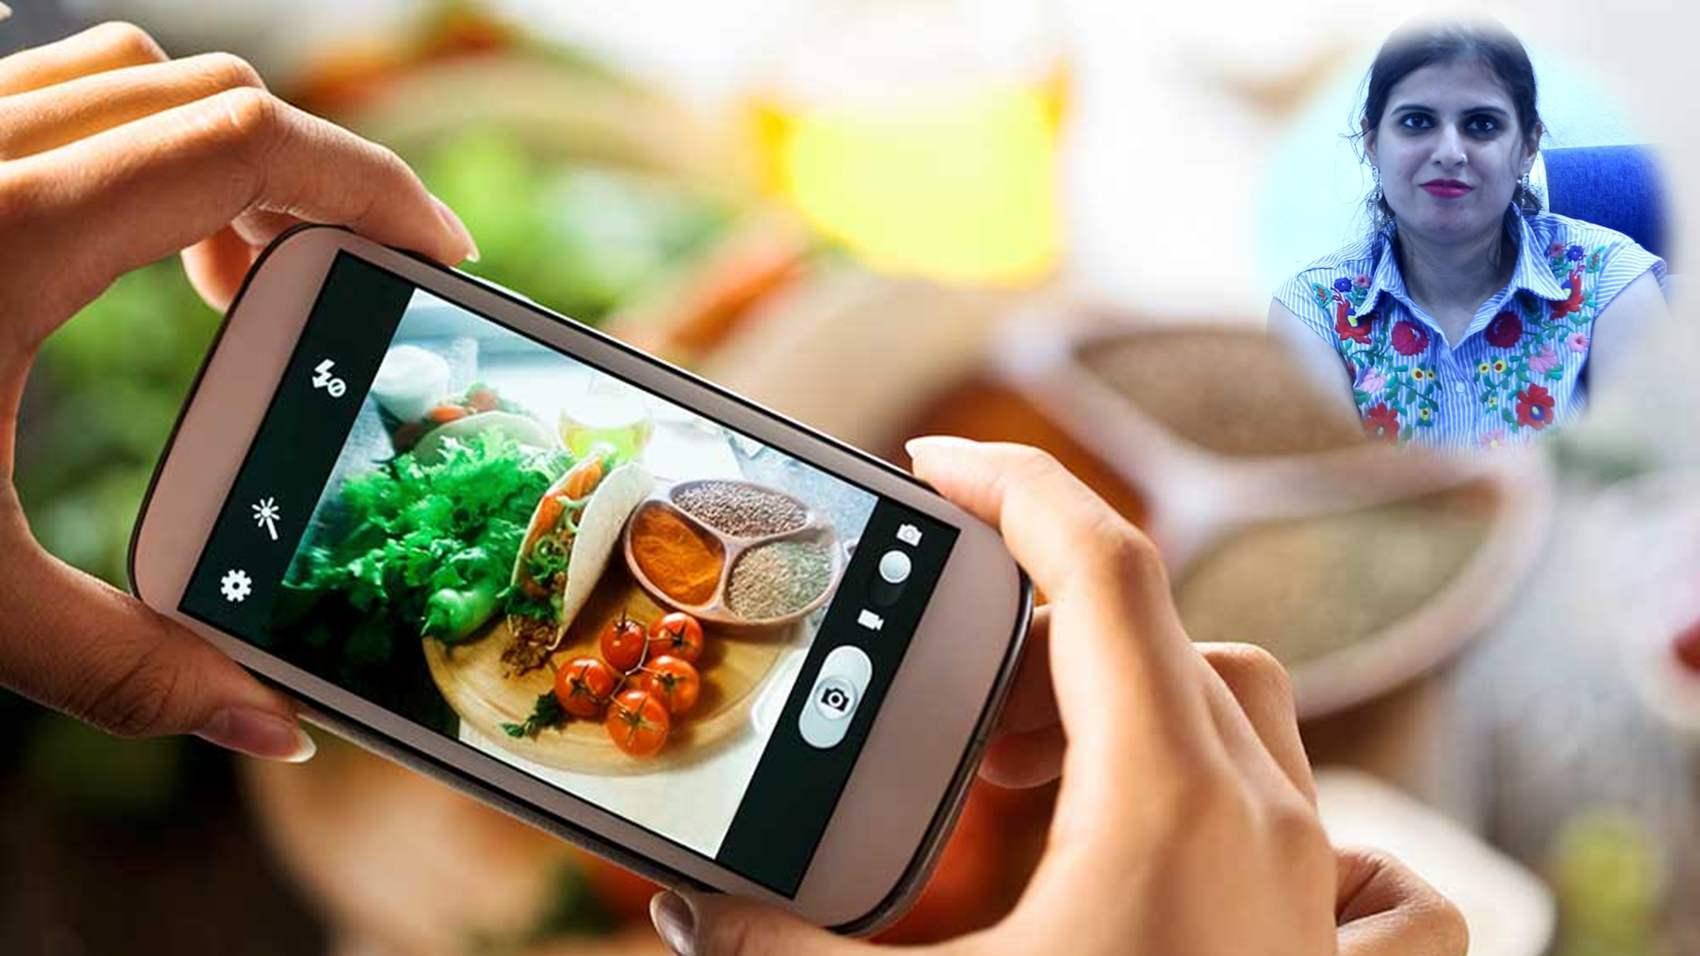 Career in Food Blogging